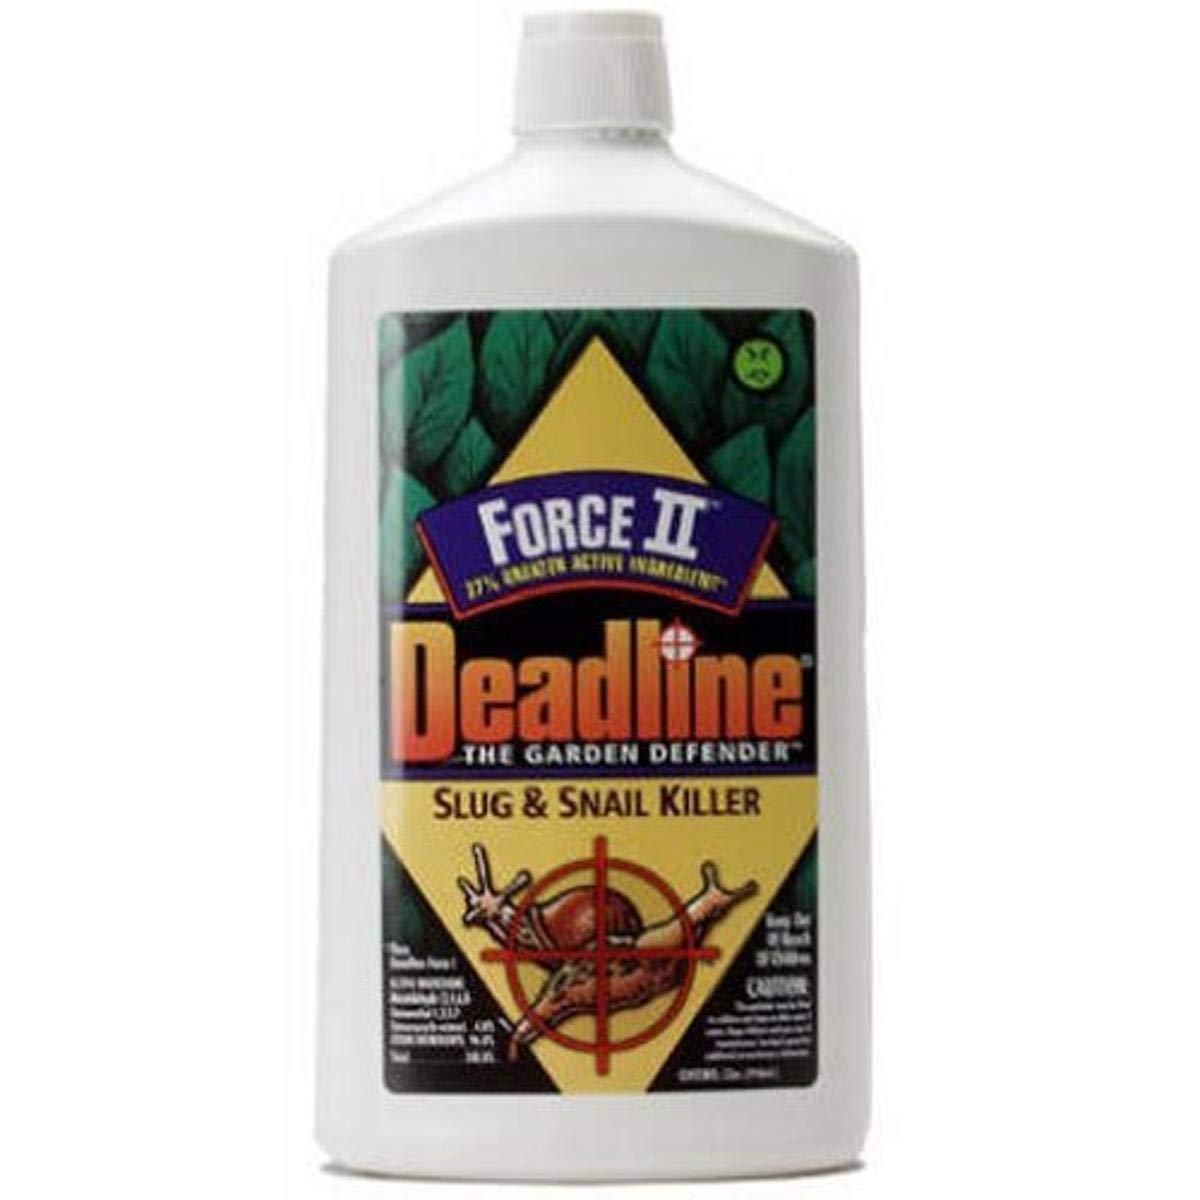 Deadline 376 100509275 Force II Slug and Snail Killer, 1-Quart